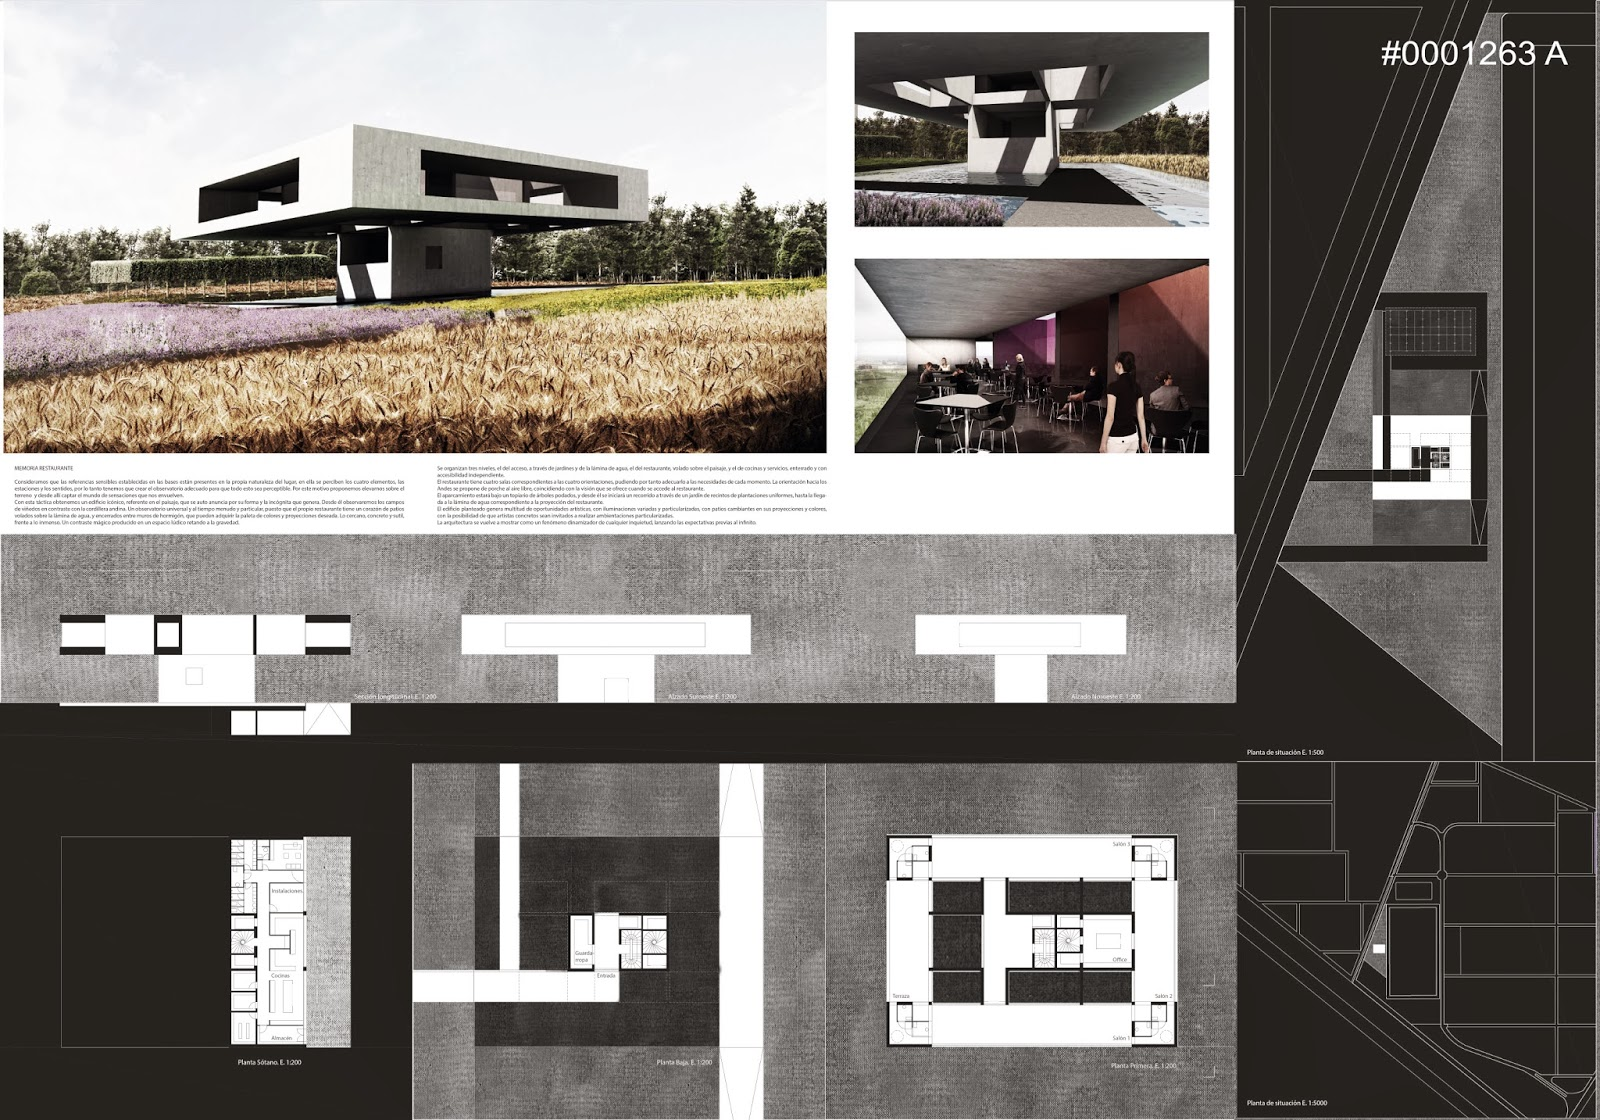 Revista digital apuntes de arquitectura primer concurso for Arquitectura definicion